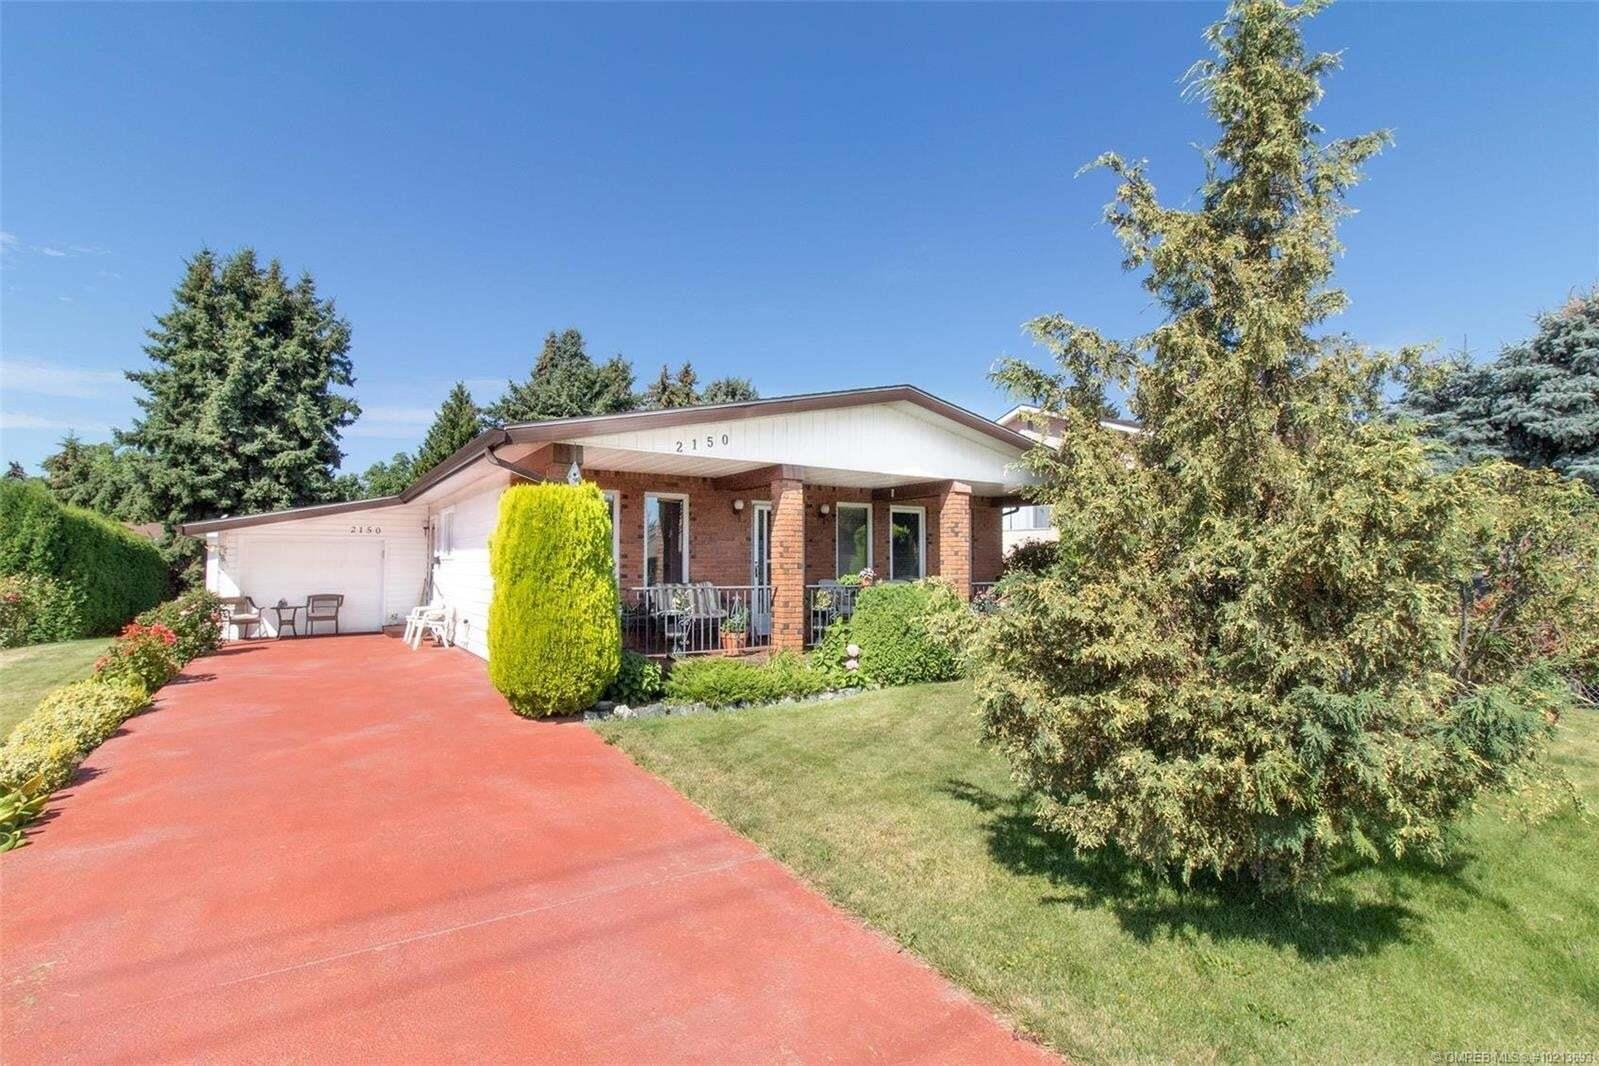 House for sale at 2150 Burtch Rd Kelowna British Columbia - MLS: 10213693